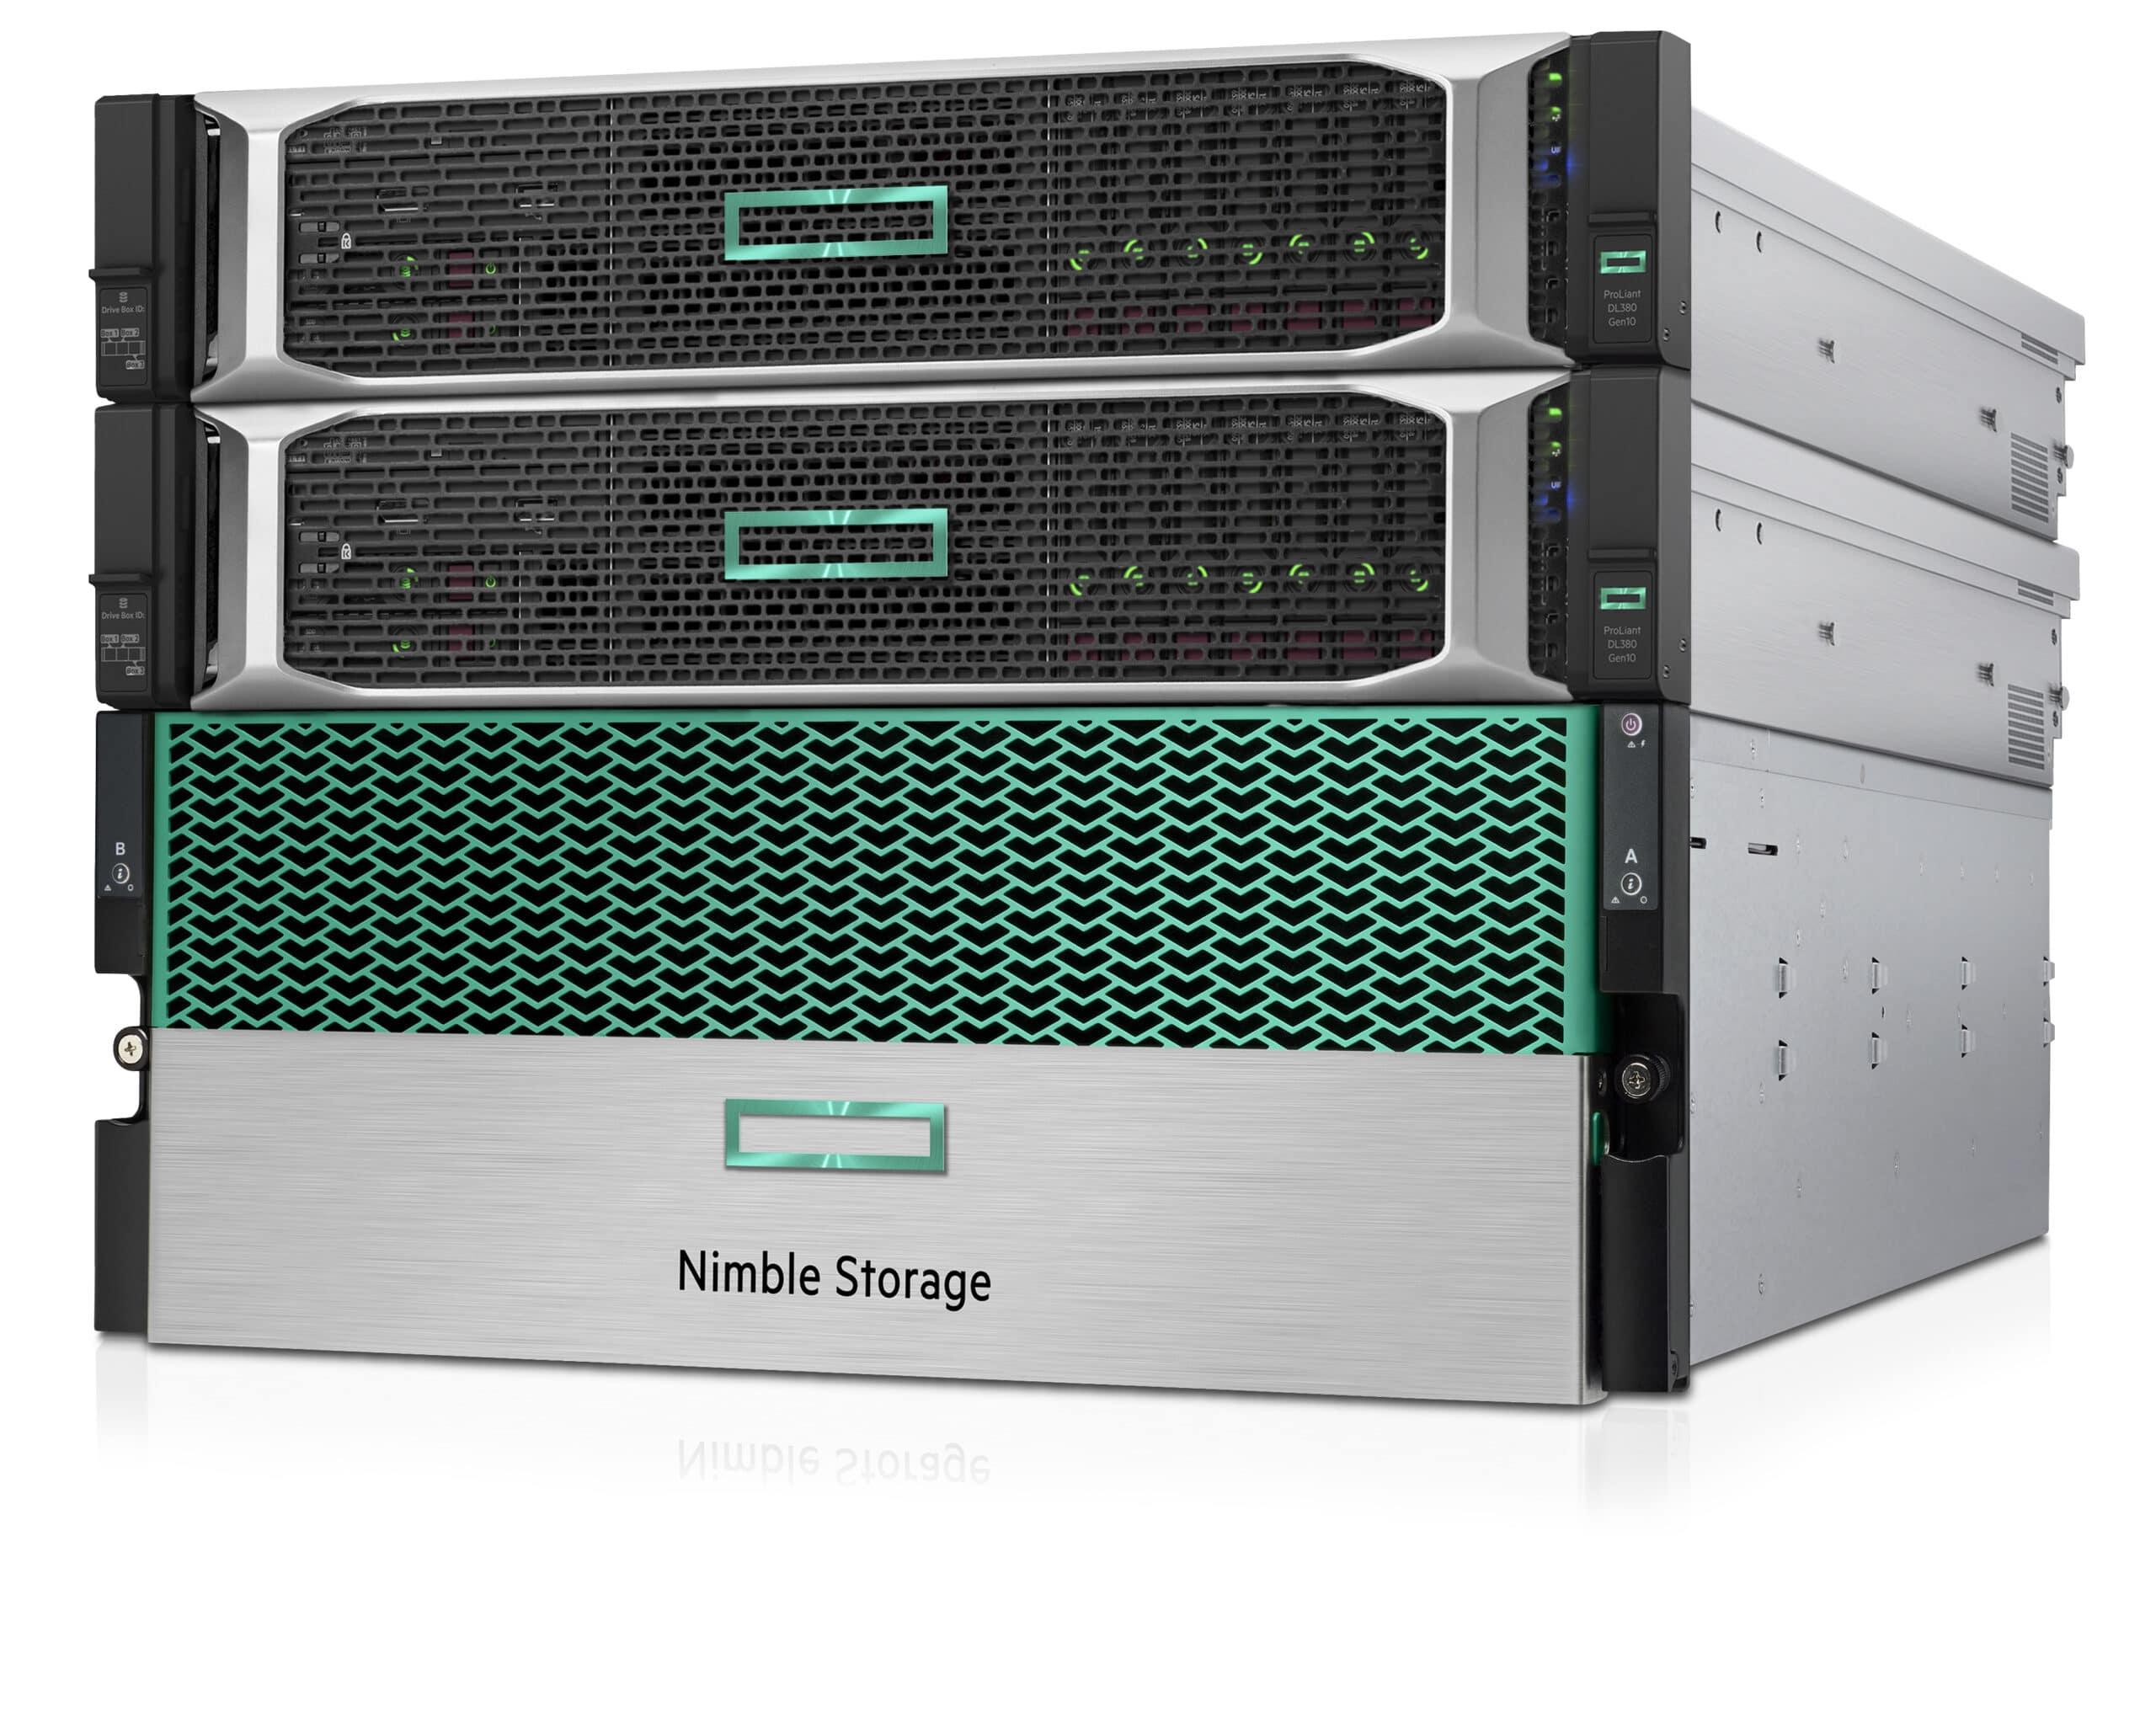 Nimble Storage's shared storage appliance